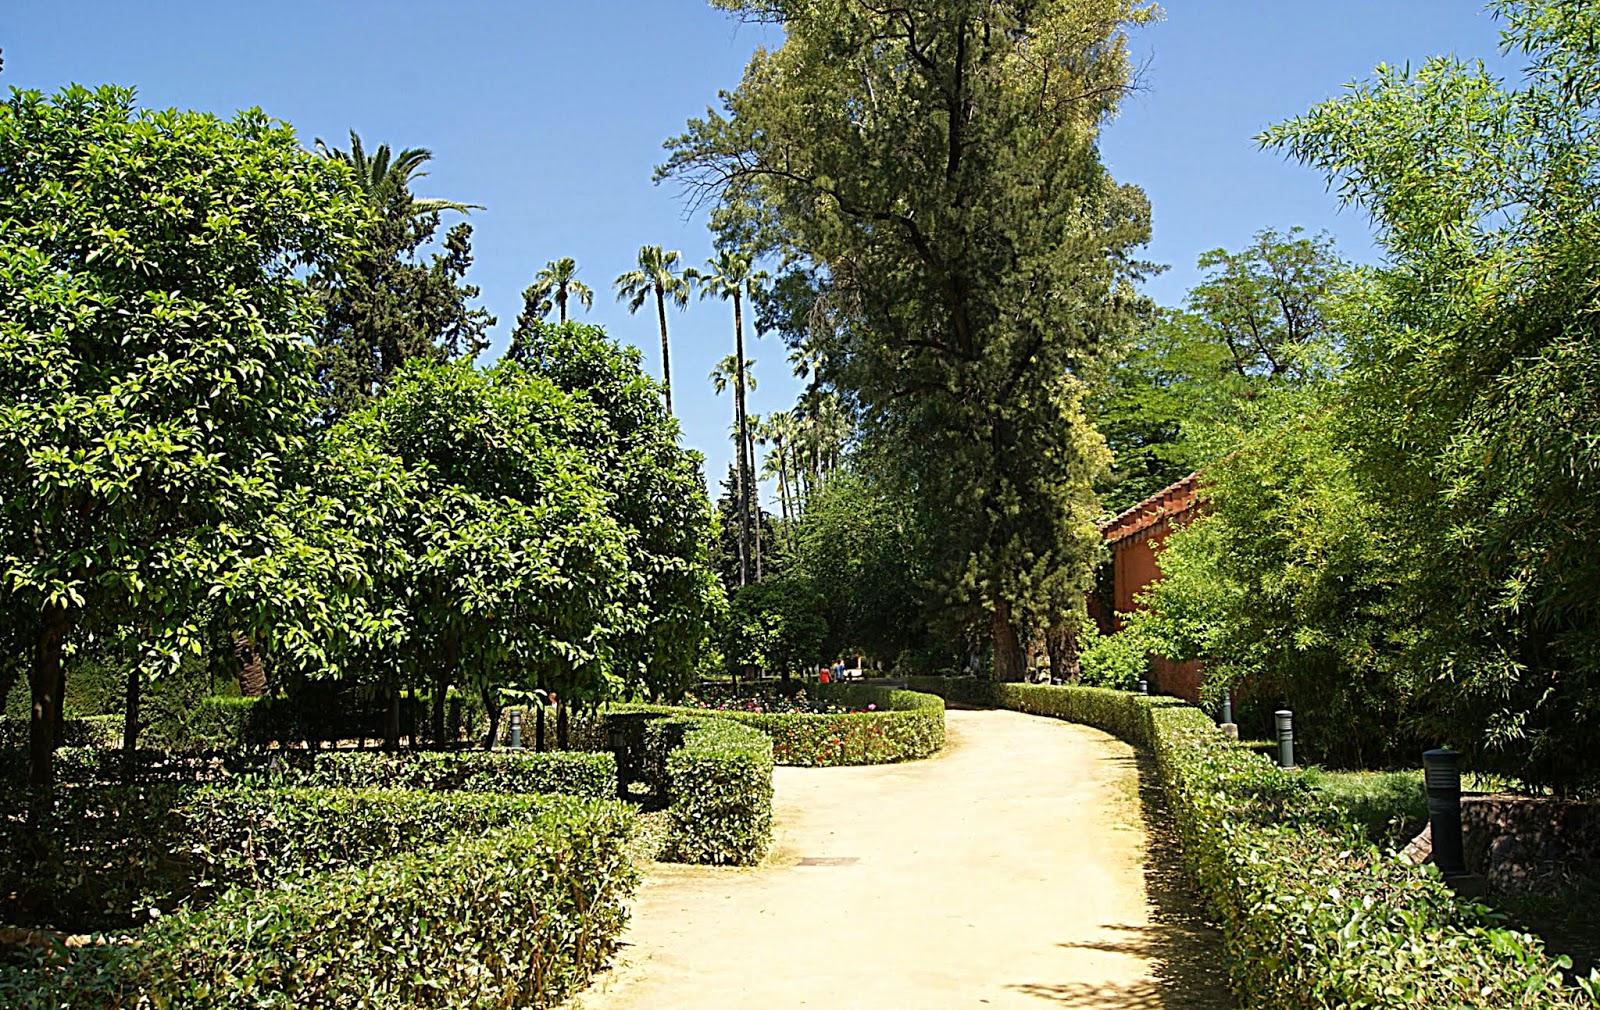 Leyendas de sevilla reales alc zares de sevilla ix los jardines de la huerta del retiro - Jardines de sevilla ...